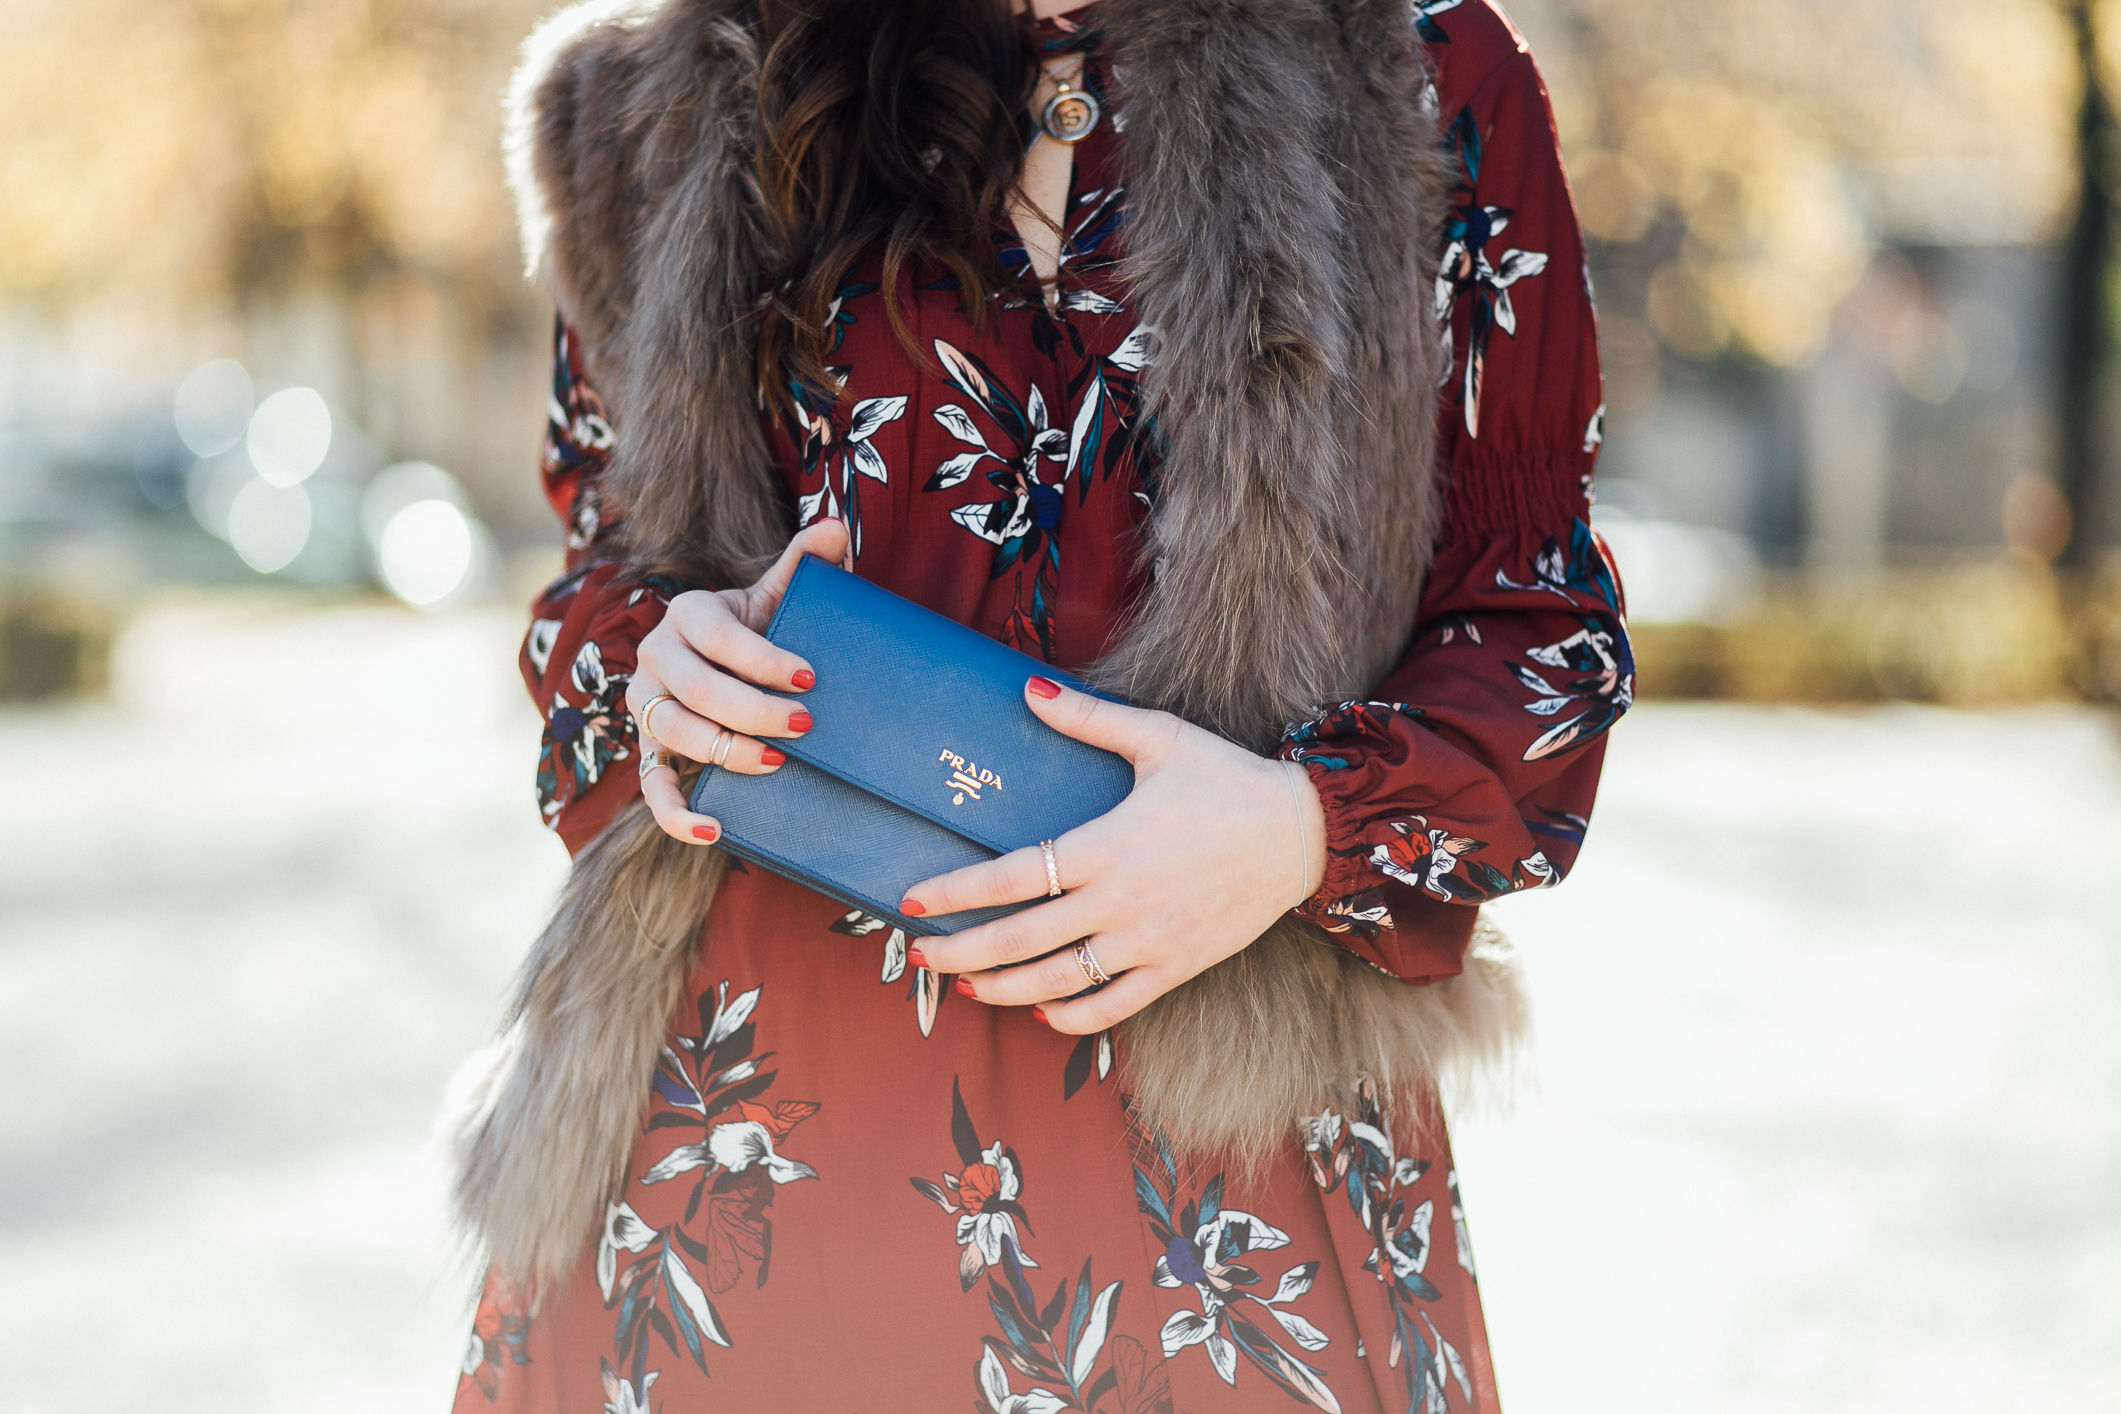 Prada-tasche-blau-outfit-inspiration-fashion-blogger